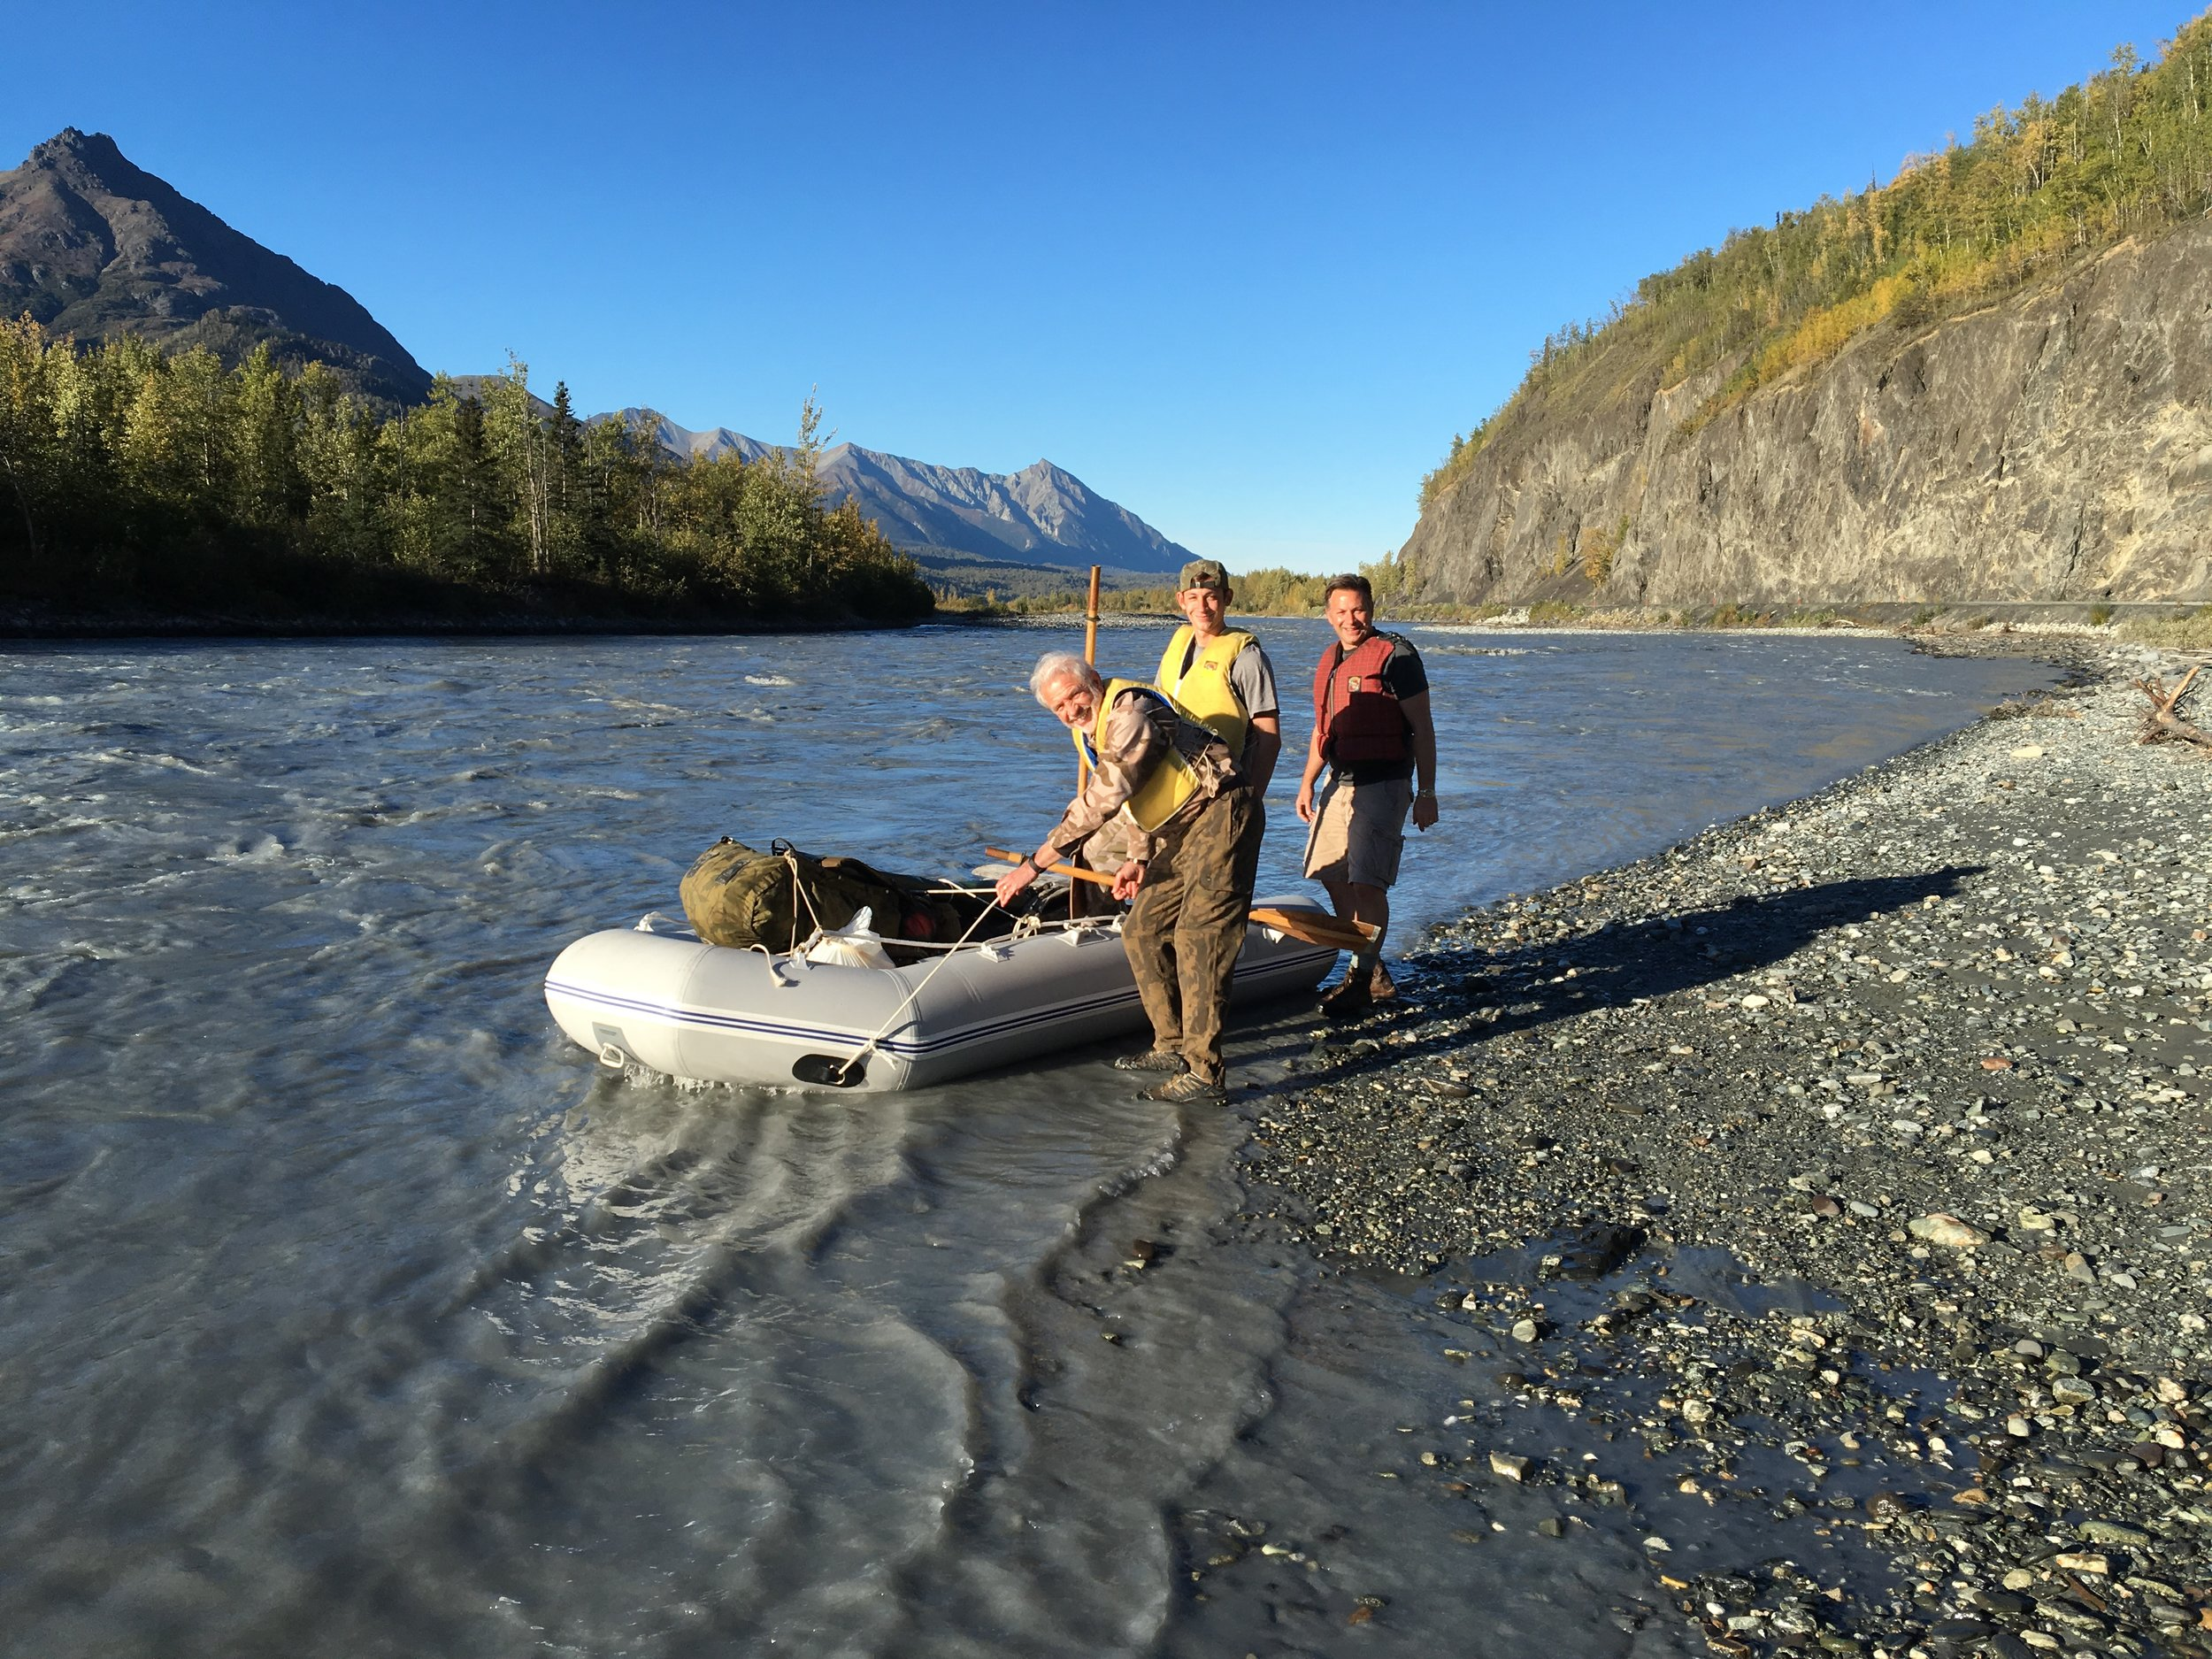 Getting ready to cross the Matanuska River.